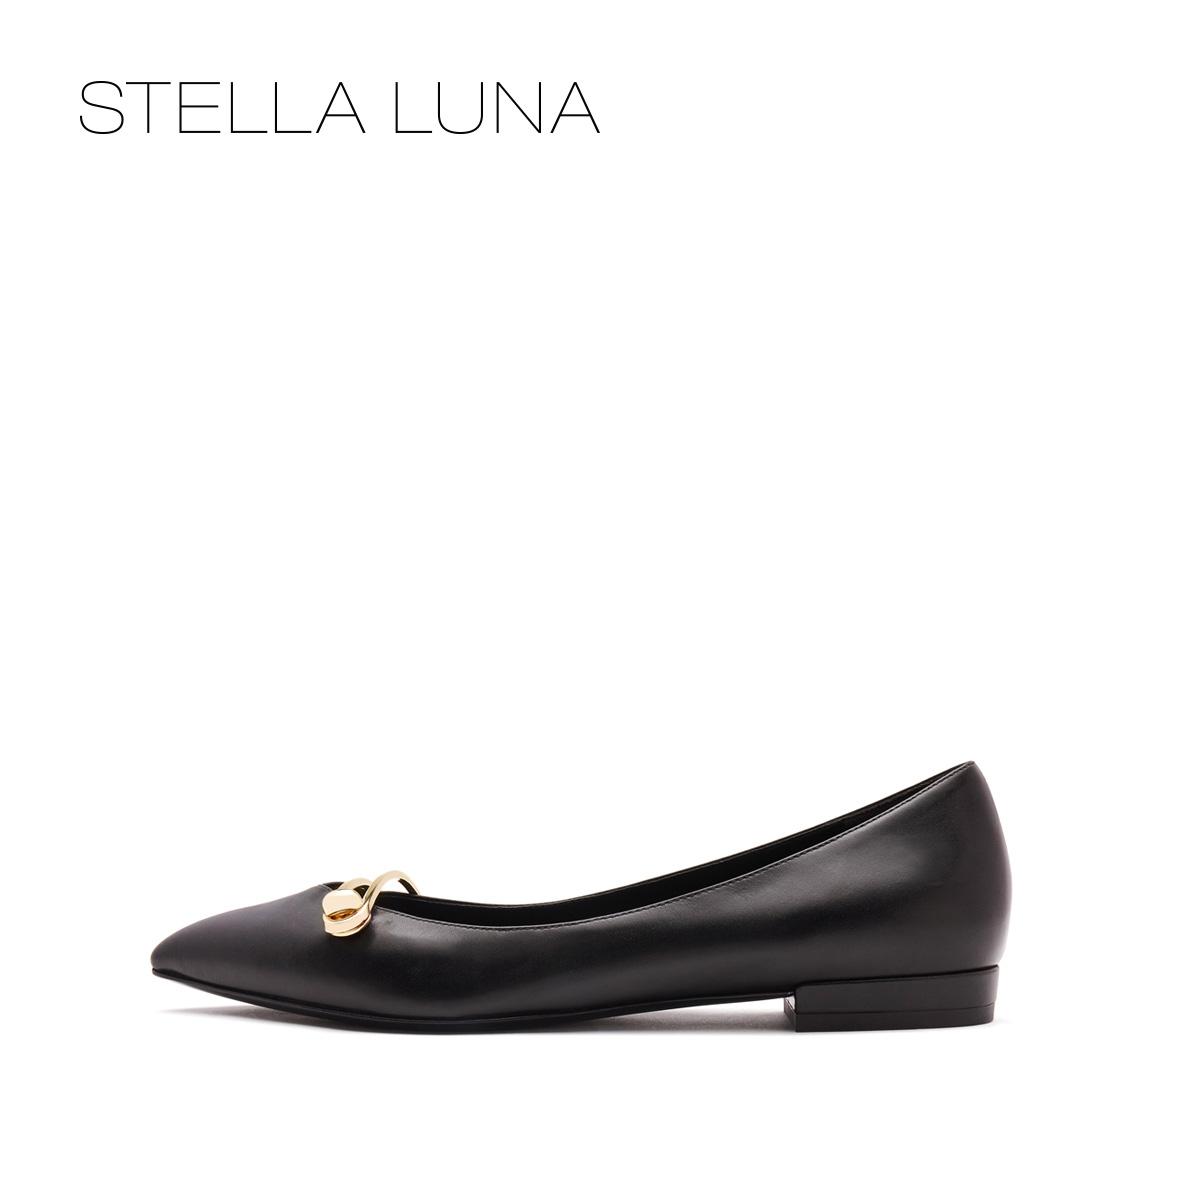 STELLA LUNA春夏新品单鞋牛皮buckle平跟女鞋SH134L24002